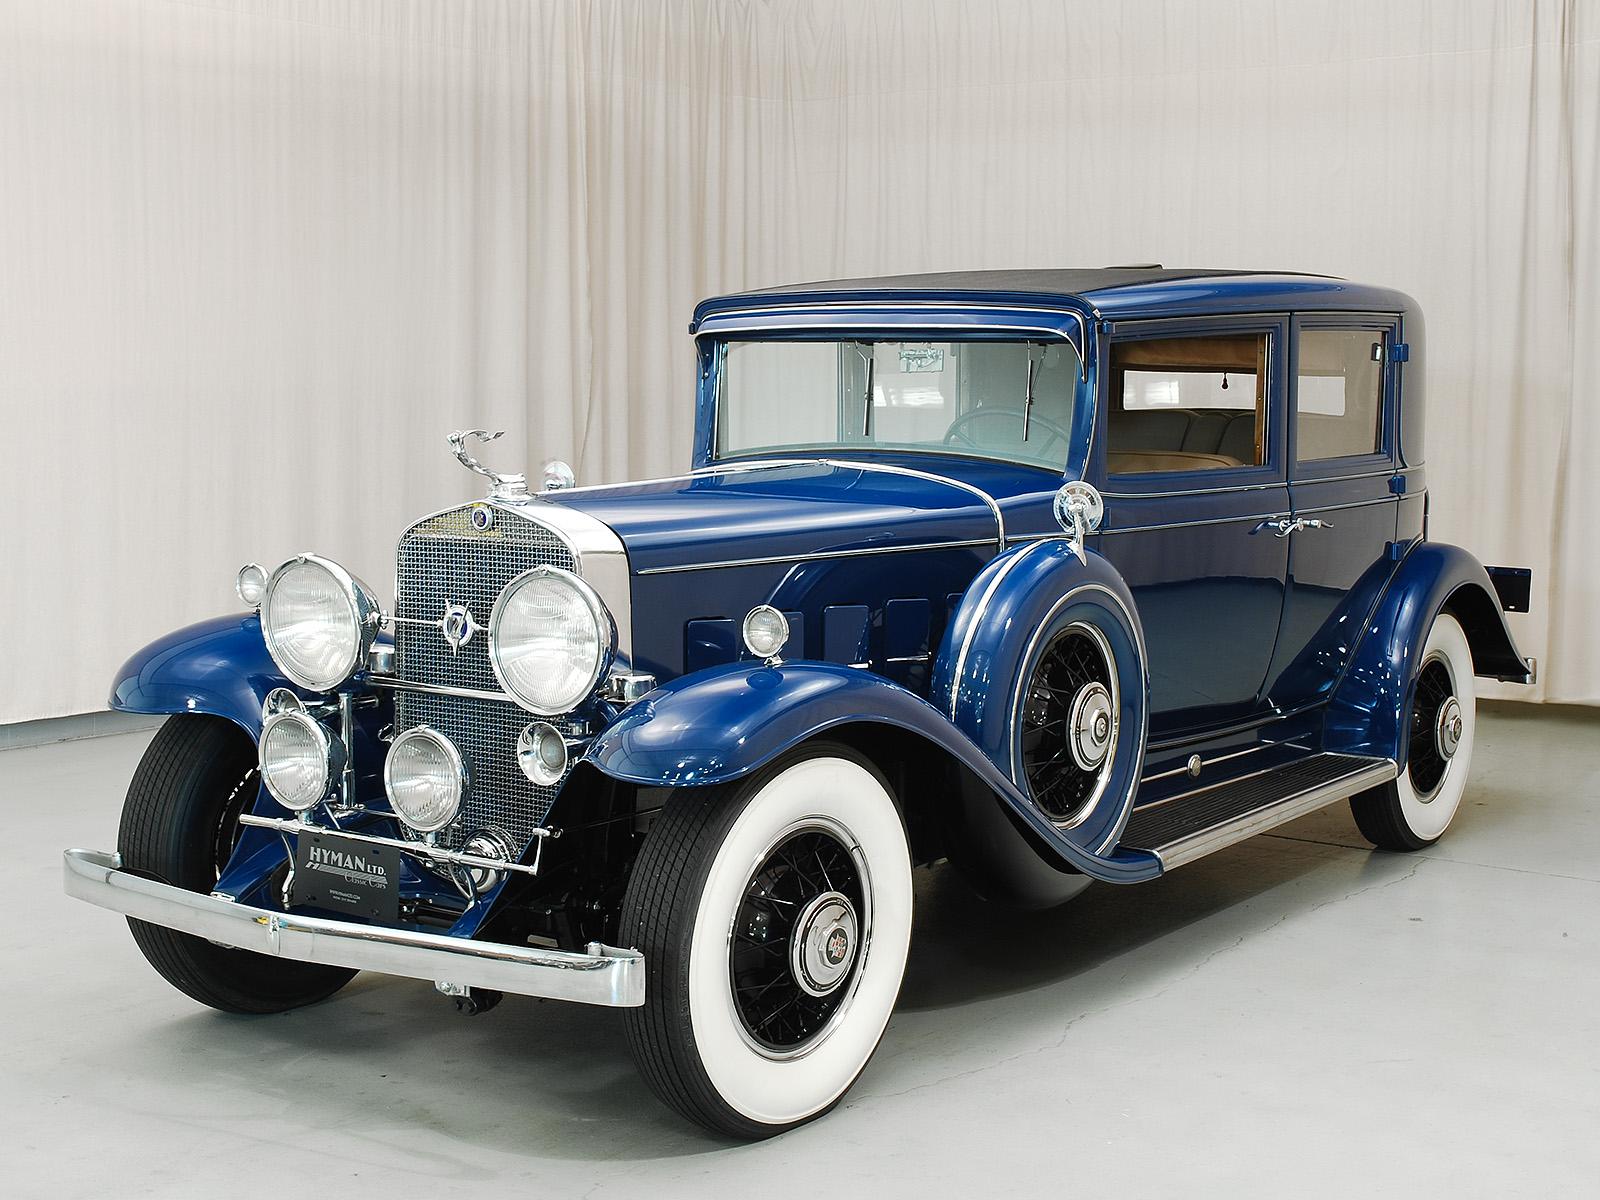 HQ 1931 Cadillac V12 Wallpapers | File 512.97Kb